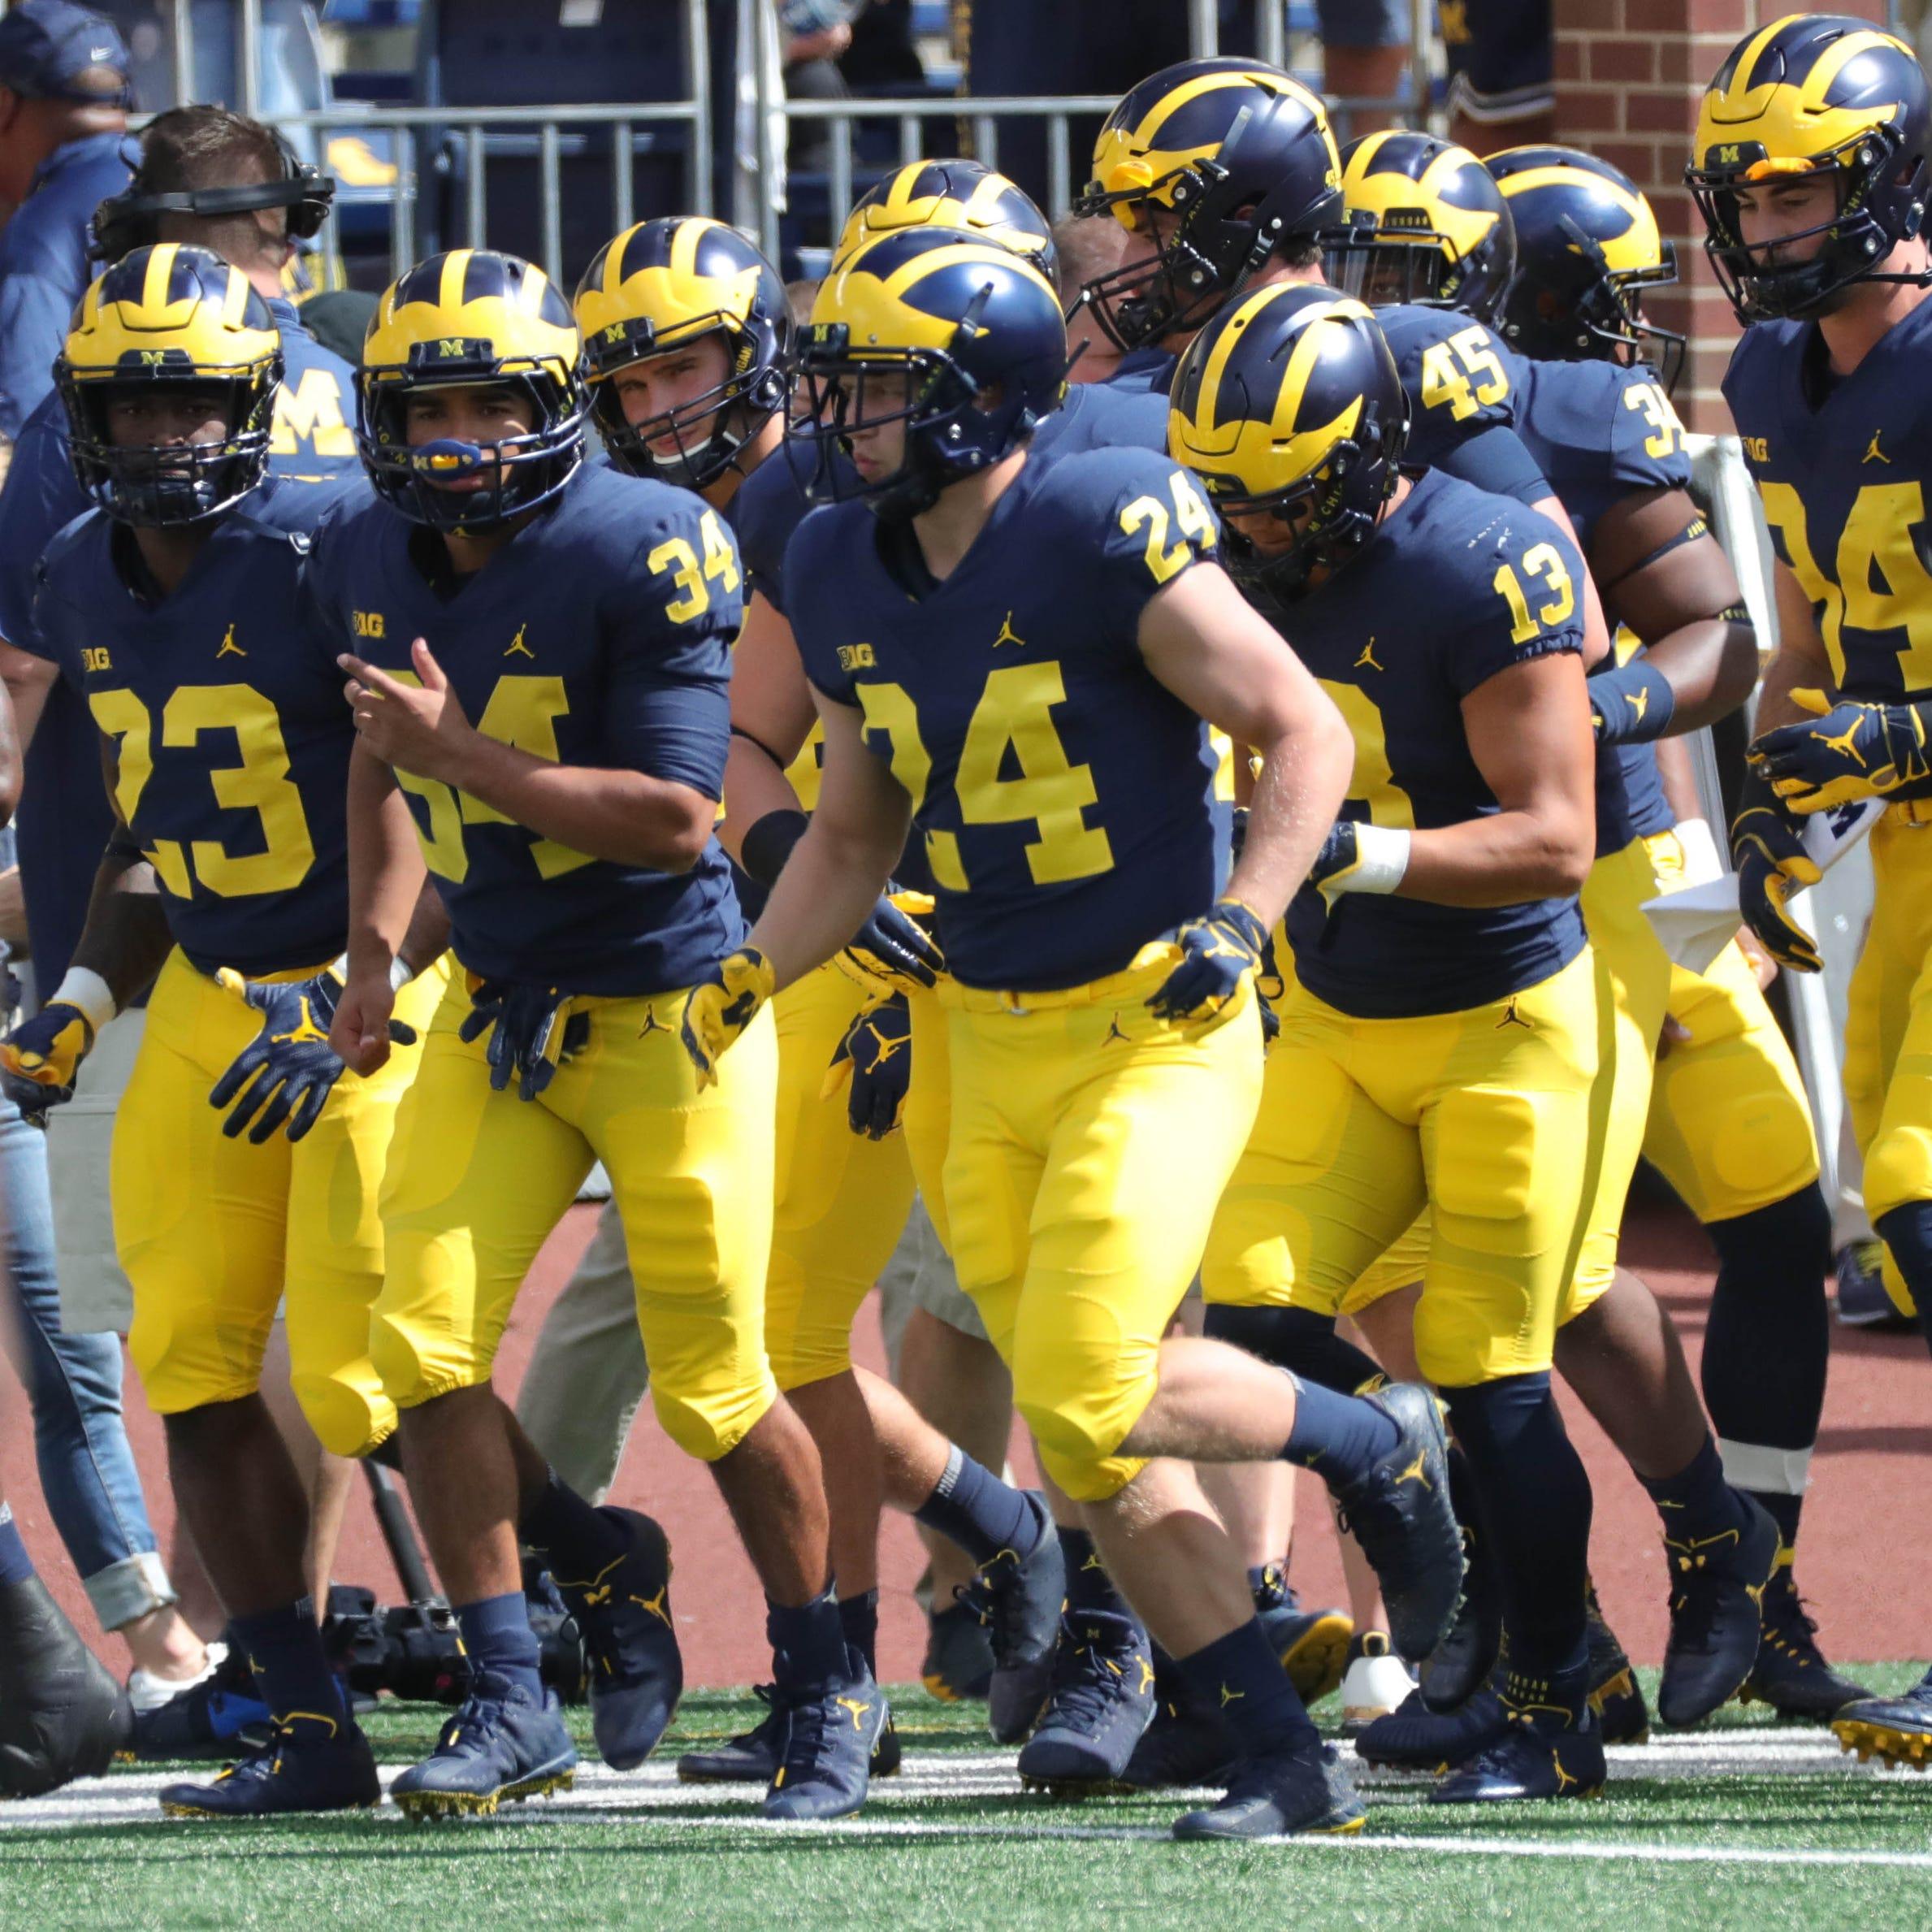 Nebraska vs. Michigan: Game time, TV channel, where to stream online